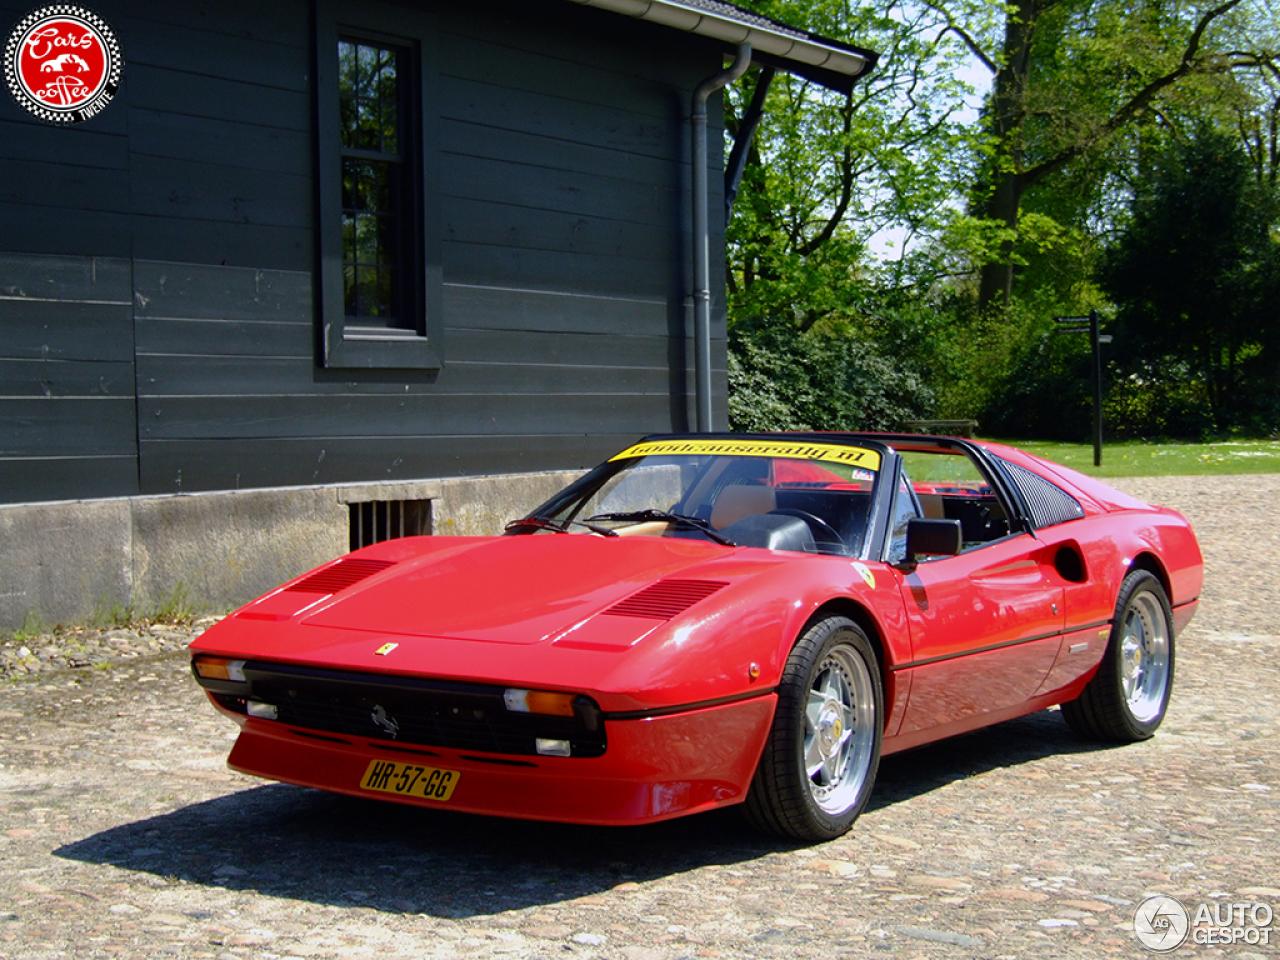 Sale additionally 1984 Ferrari 308 Gts Qv 7d9372 Wingsdomain Art And Photography besides Sale further File Ferrari 308 quattrovalvole  Spu 2013 09 15 besides 253 Ferrari 355 Interior Wallpaper 4. on ferrari 308 gtsi sale